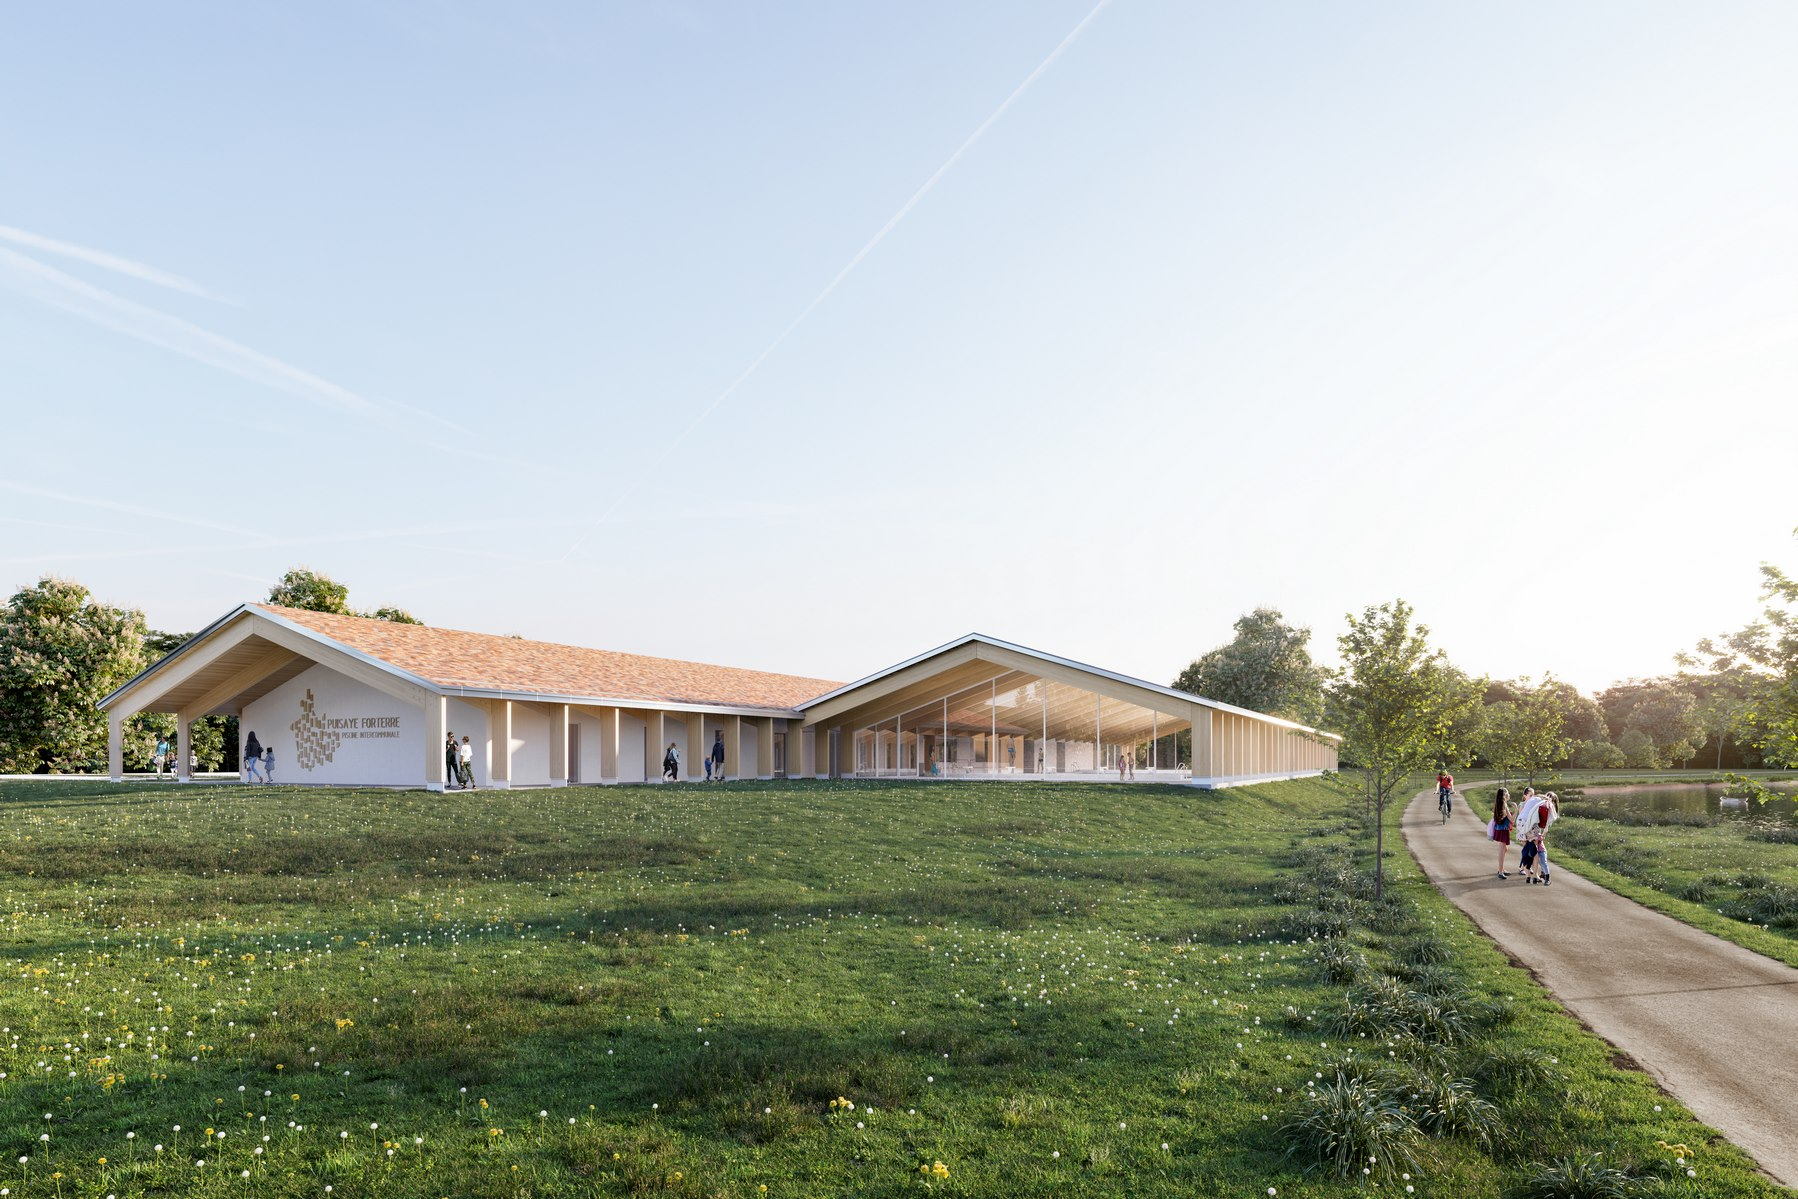 Piscine intercommunale de Toucy - Z Architecture